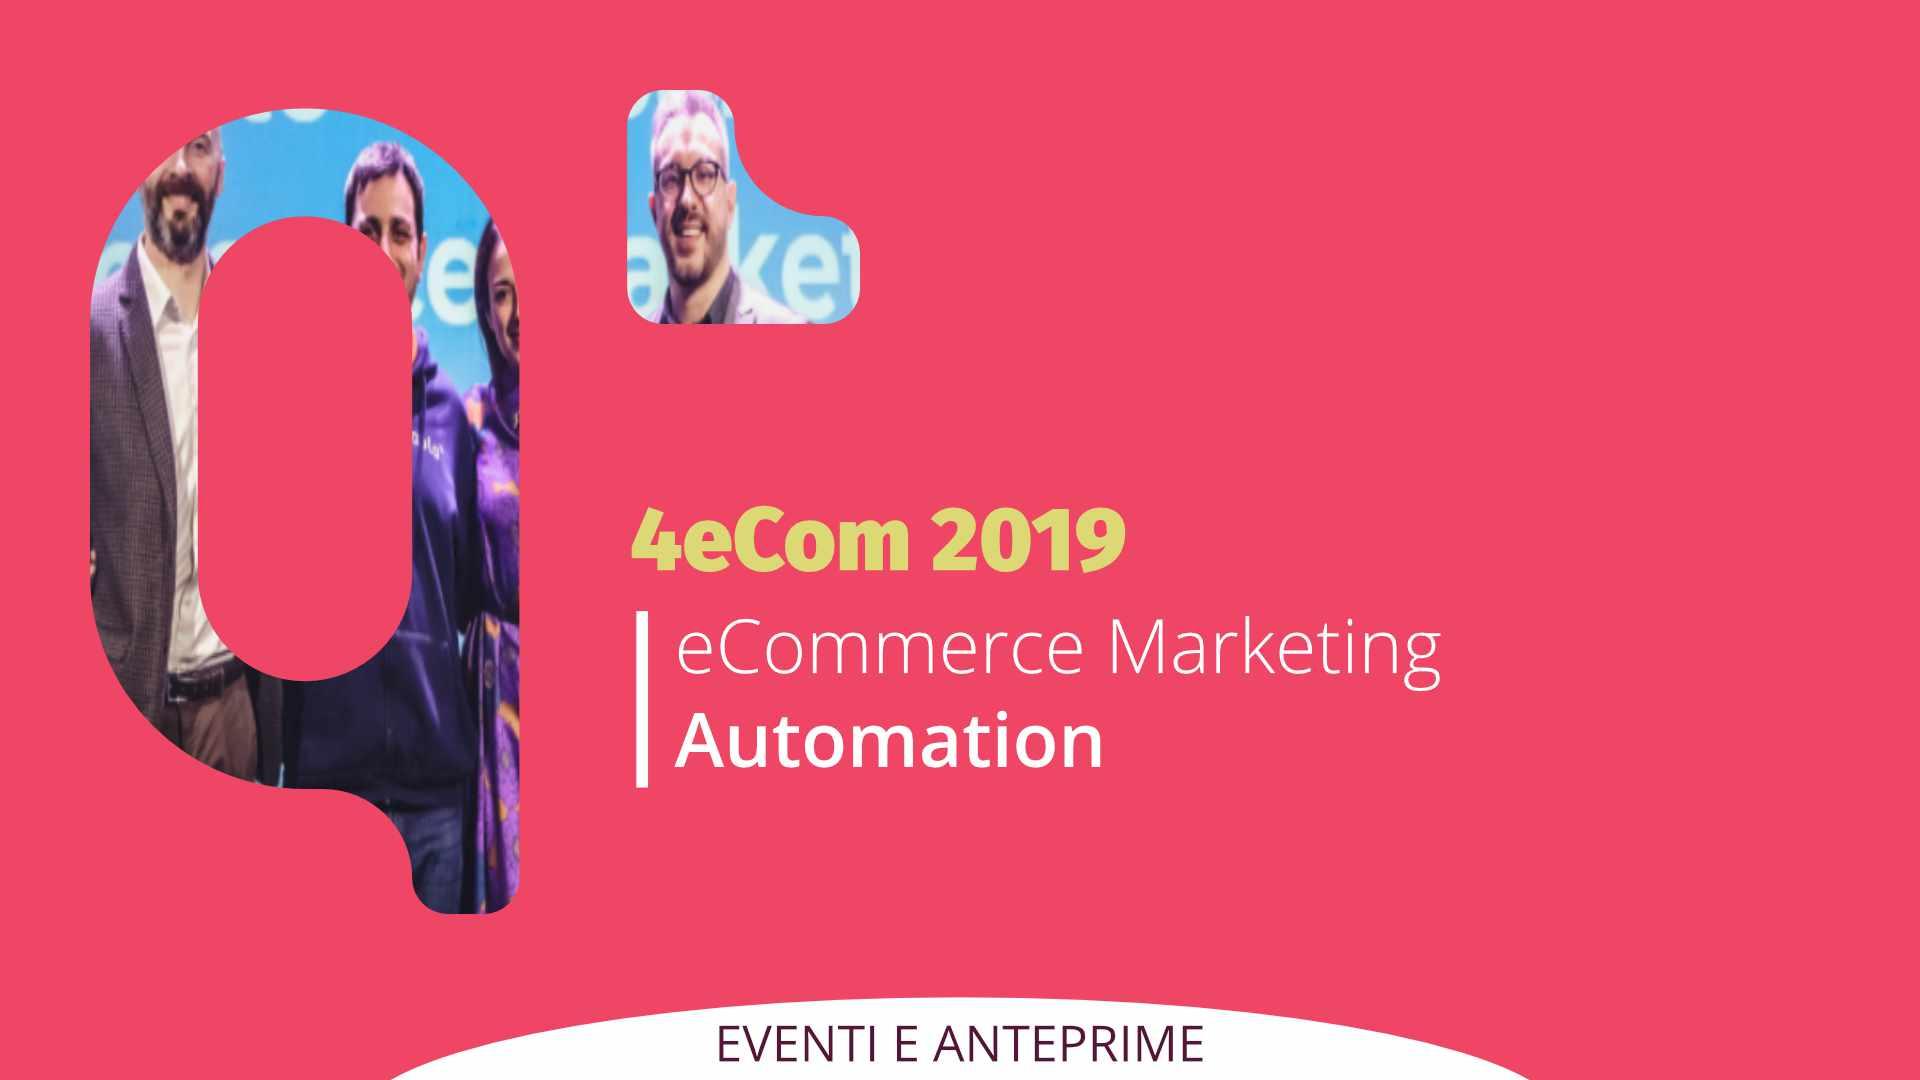 eCommerce Marketing Automation: Grande Successo per 4eCom 2019